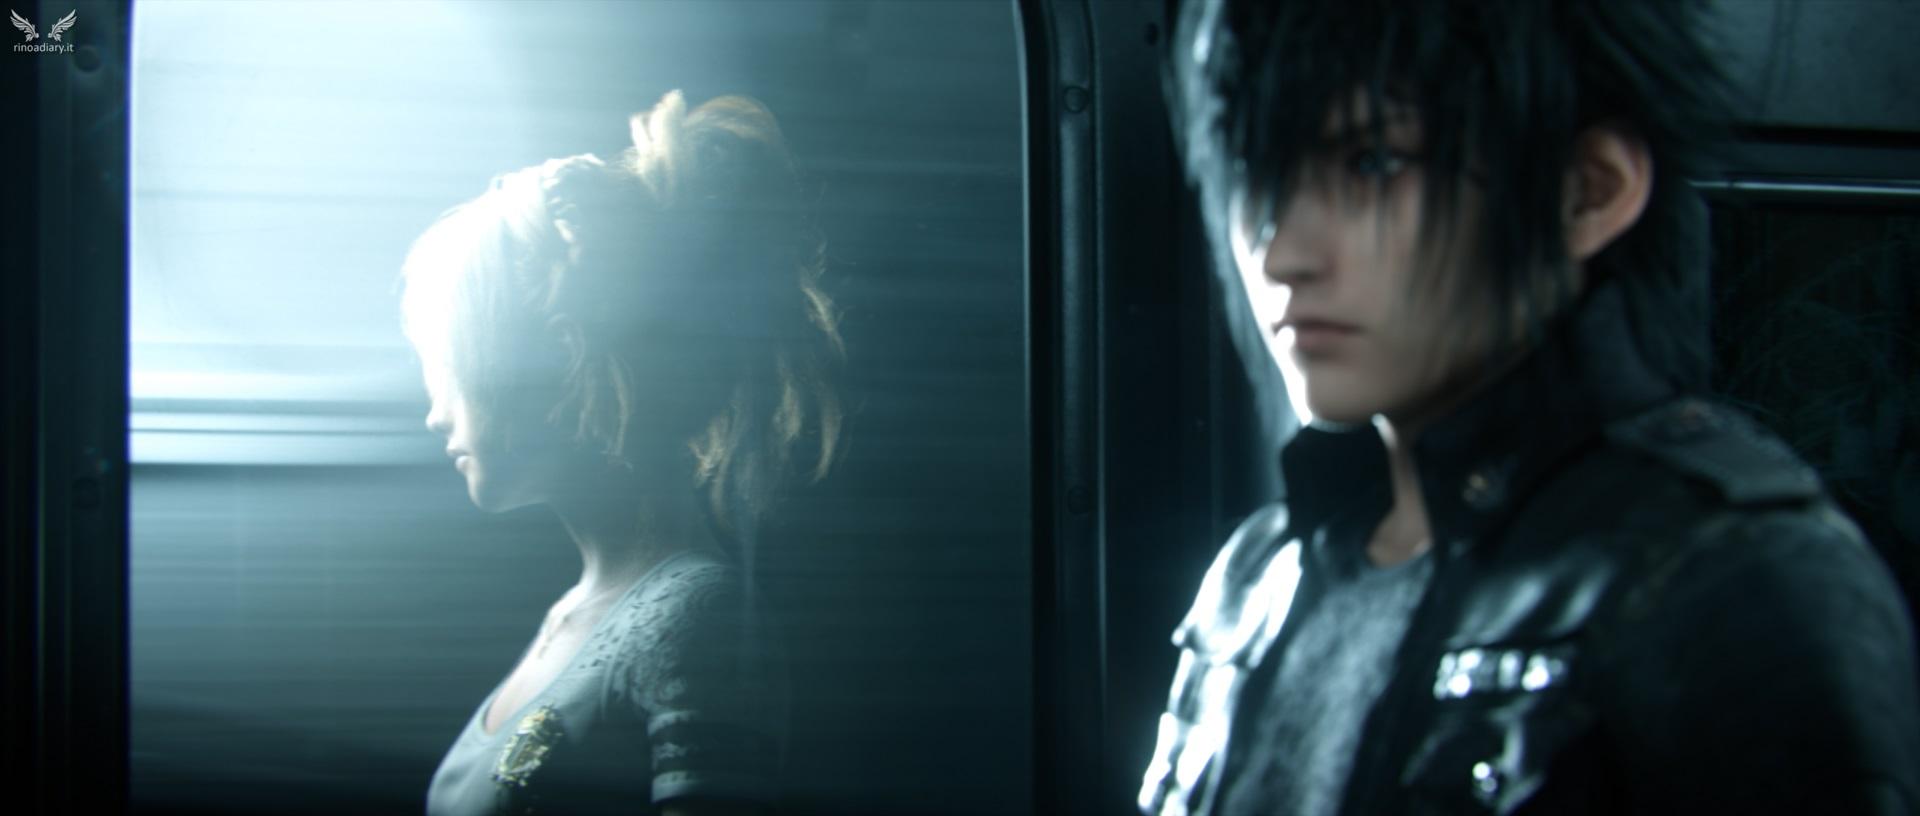 Final Fantasy XV - Omen - #9